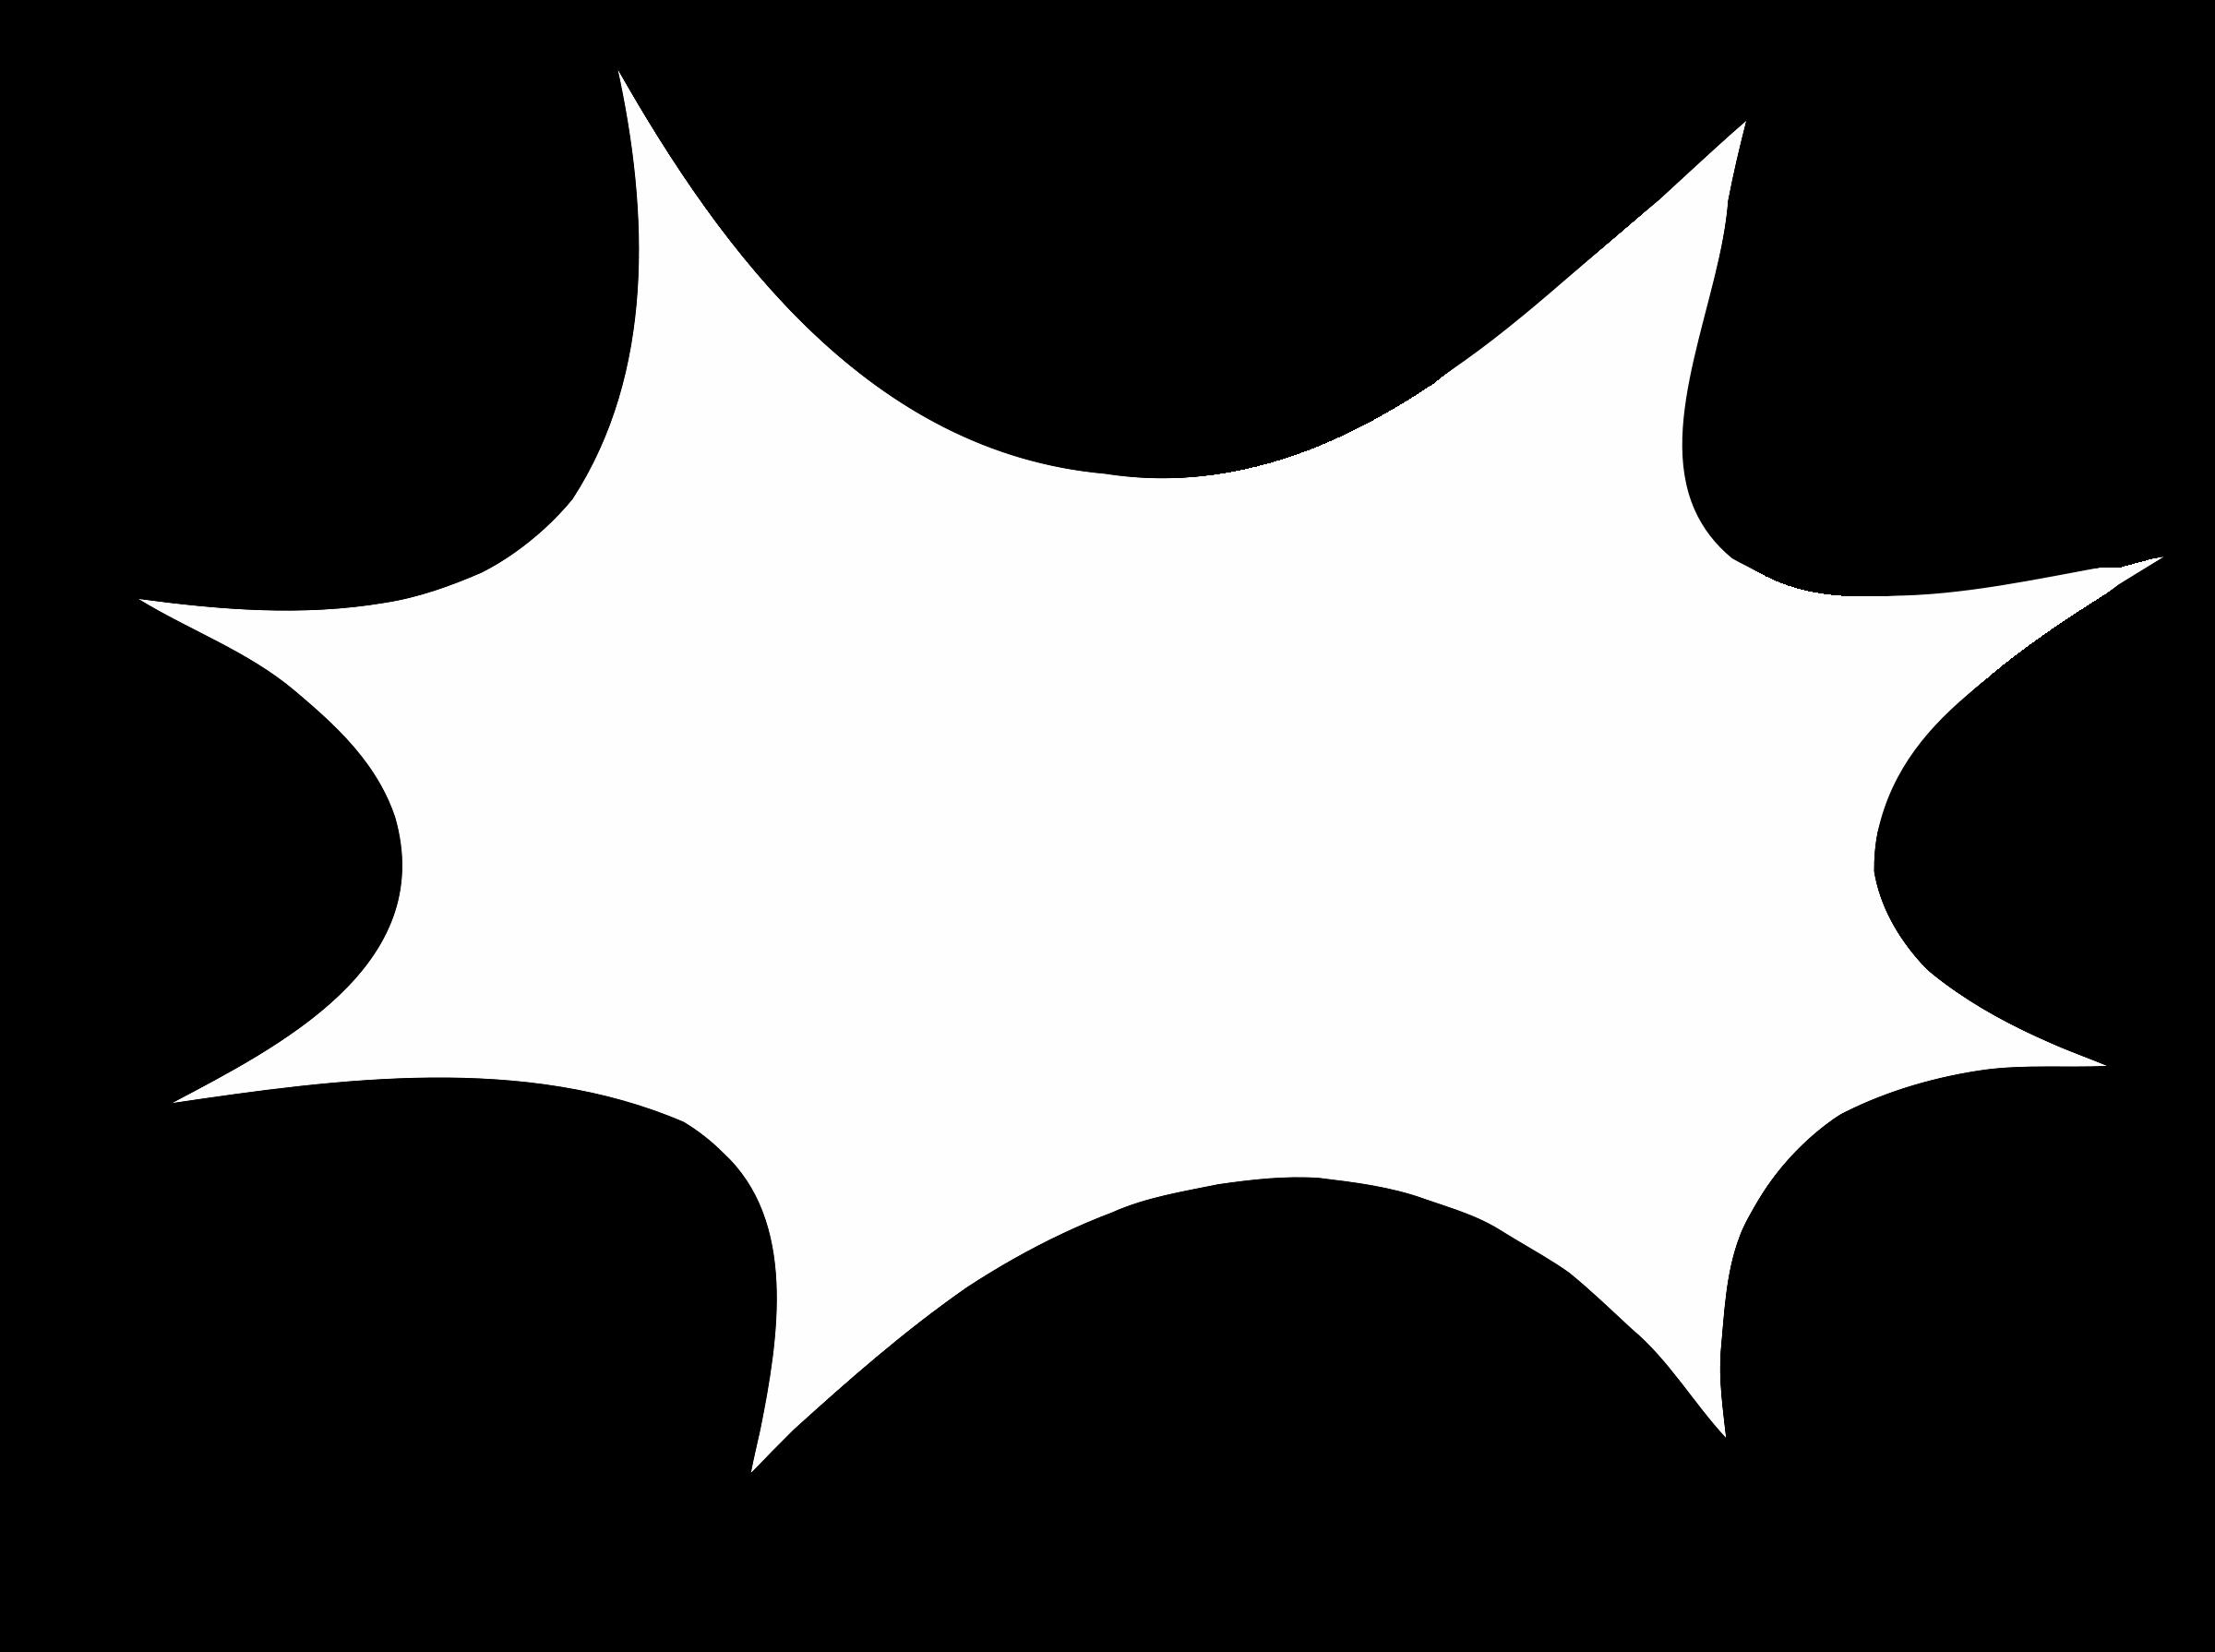 star free cliparts. Burst clipart black